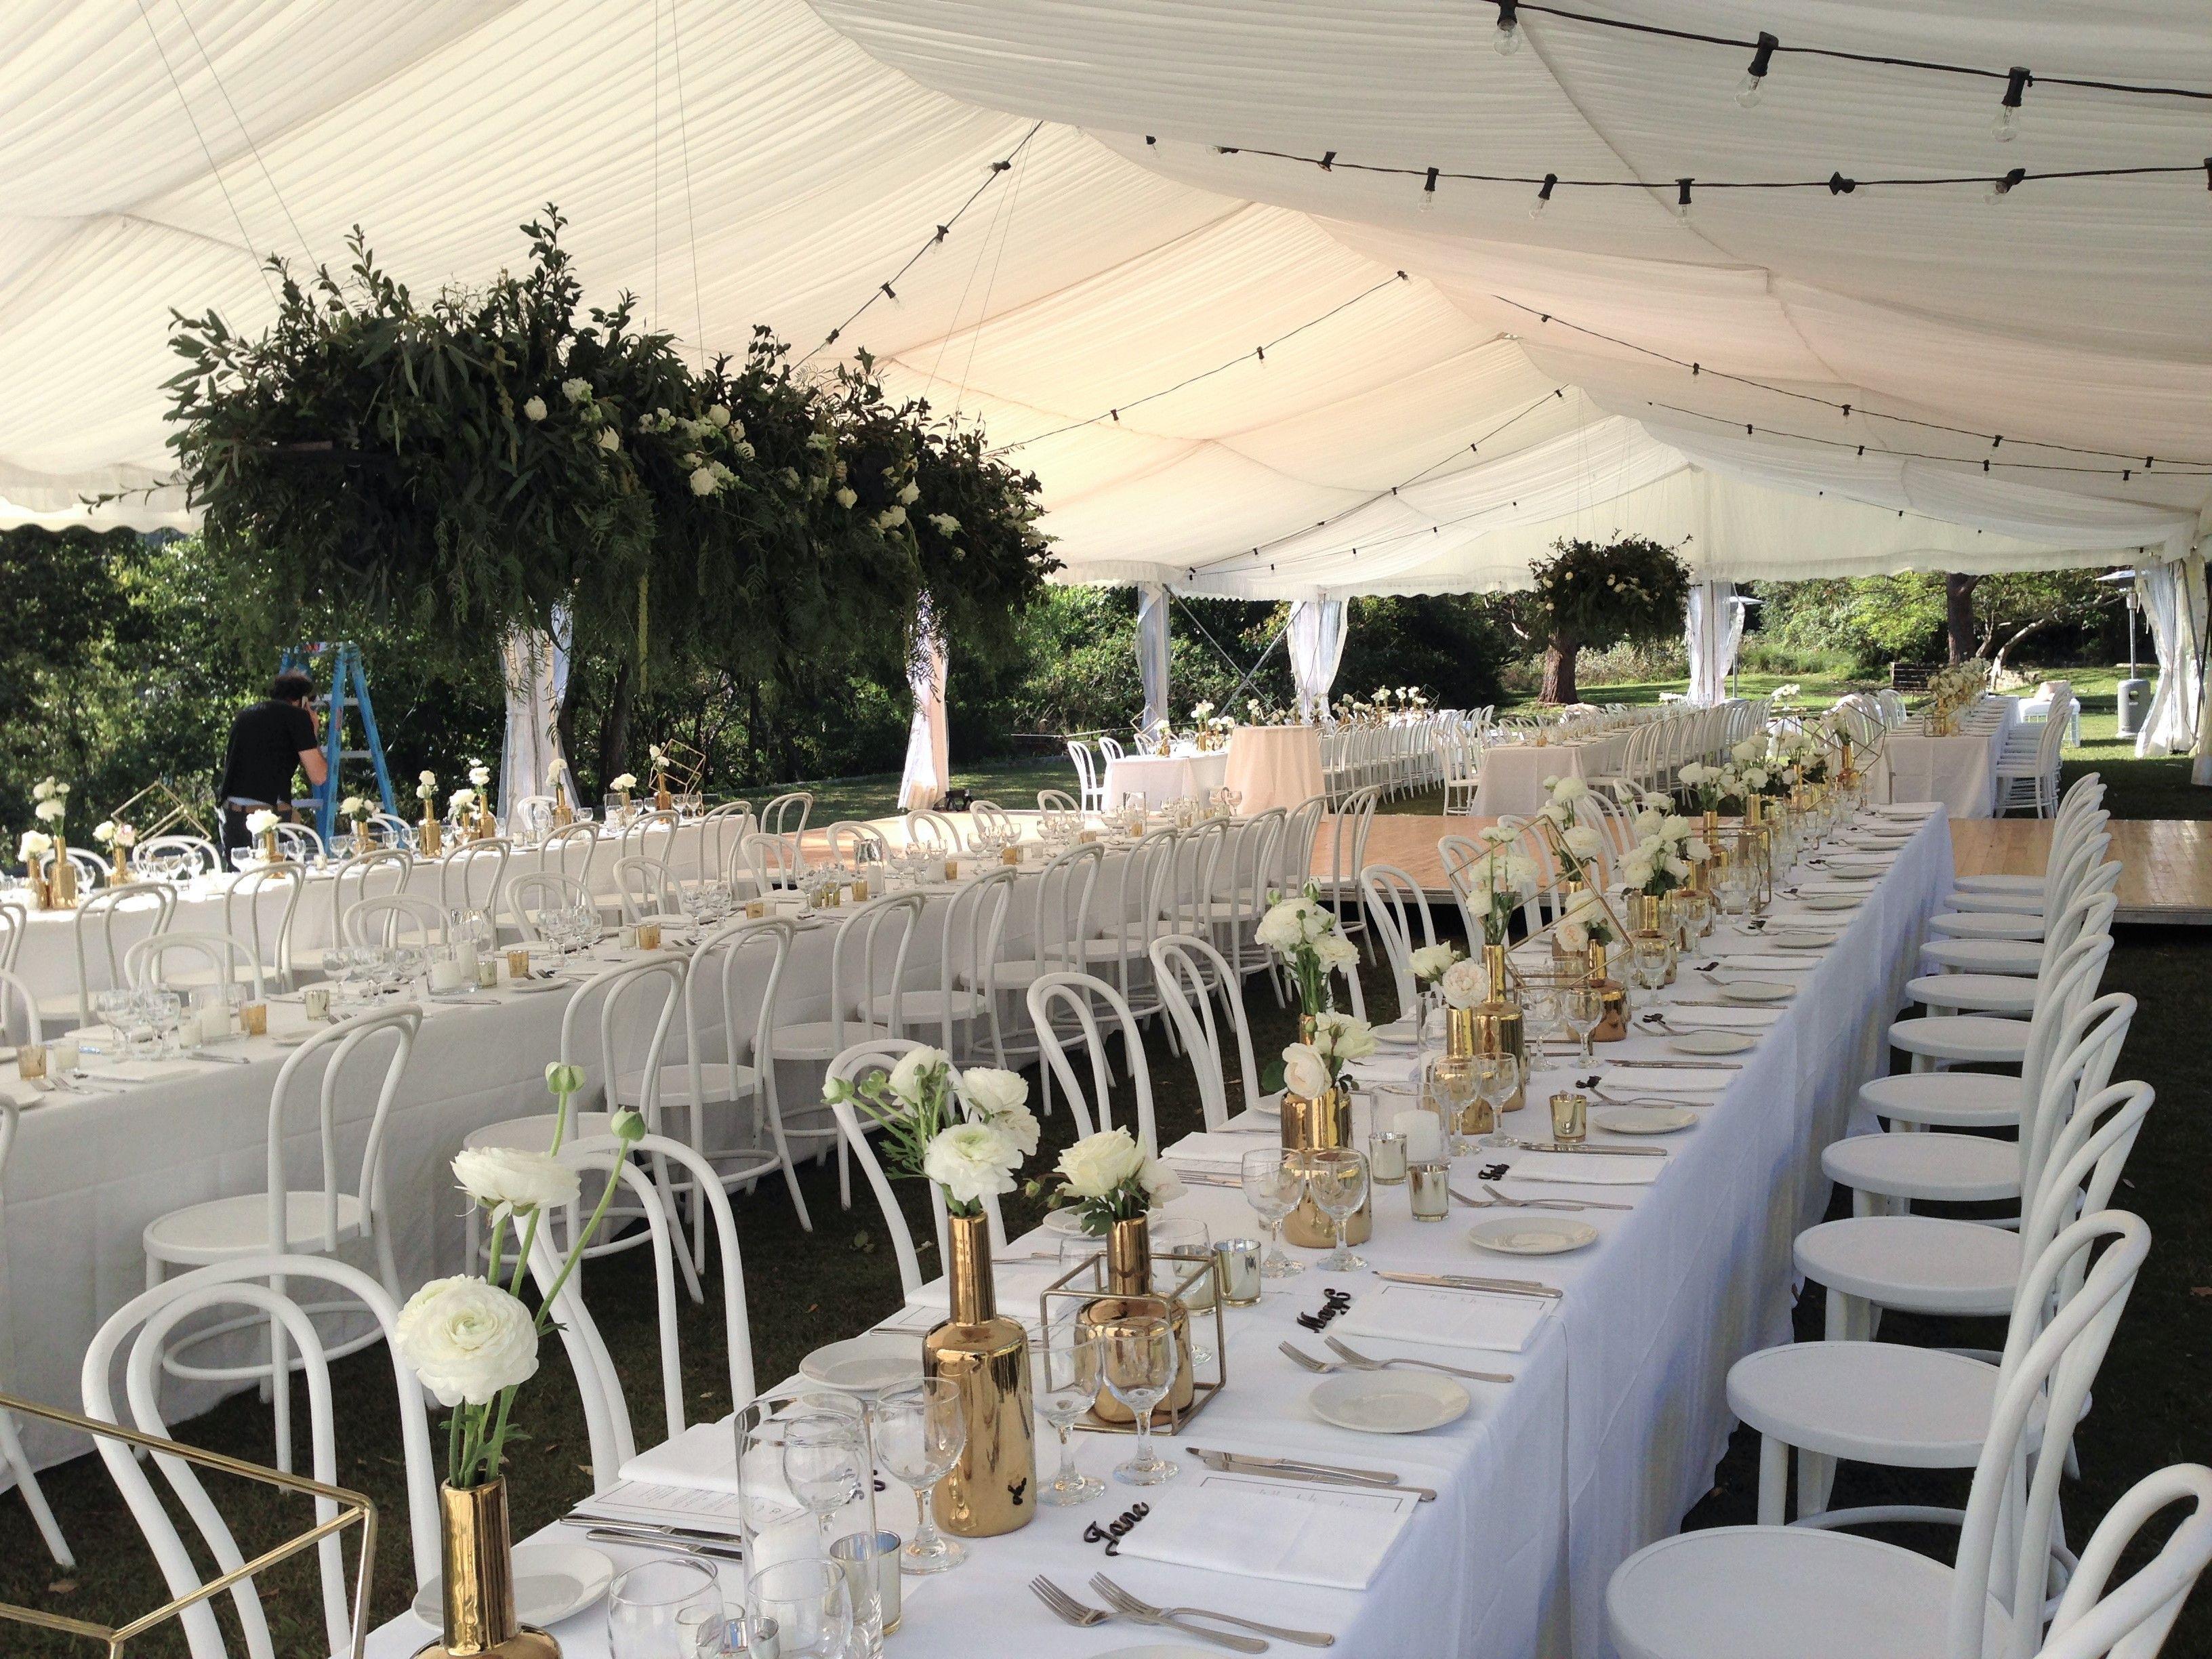 our beautiful wedding marquee at athol hall mosman 10m x